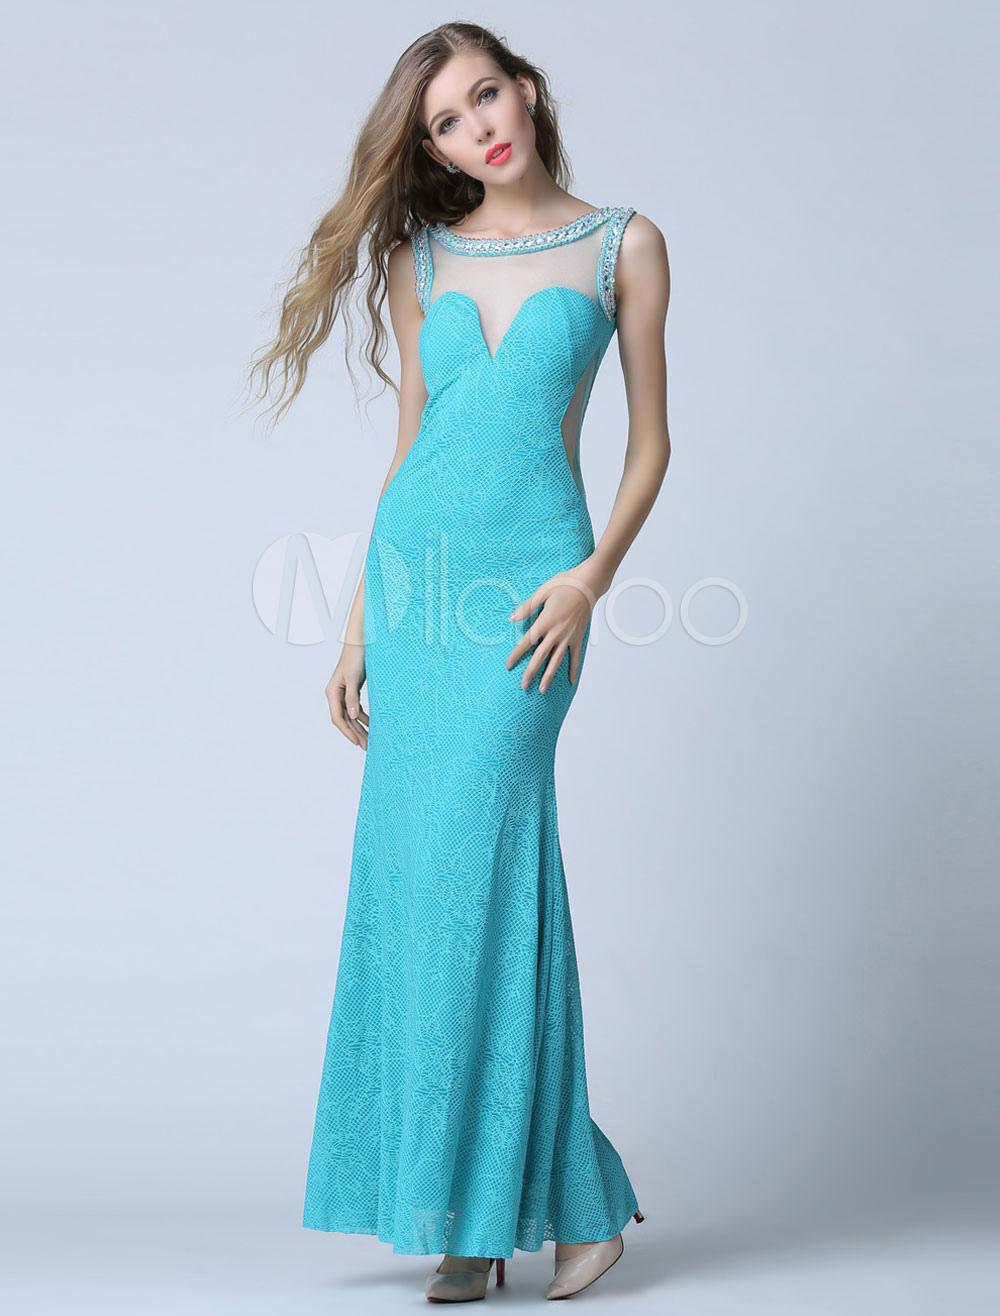 Sky Blue Prom Dress Sheath Illusion Backless Evening Dress (Wedding Cheap Party Dress) photo